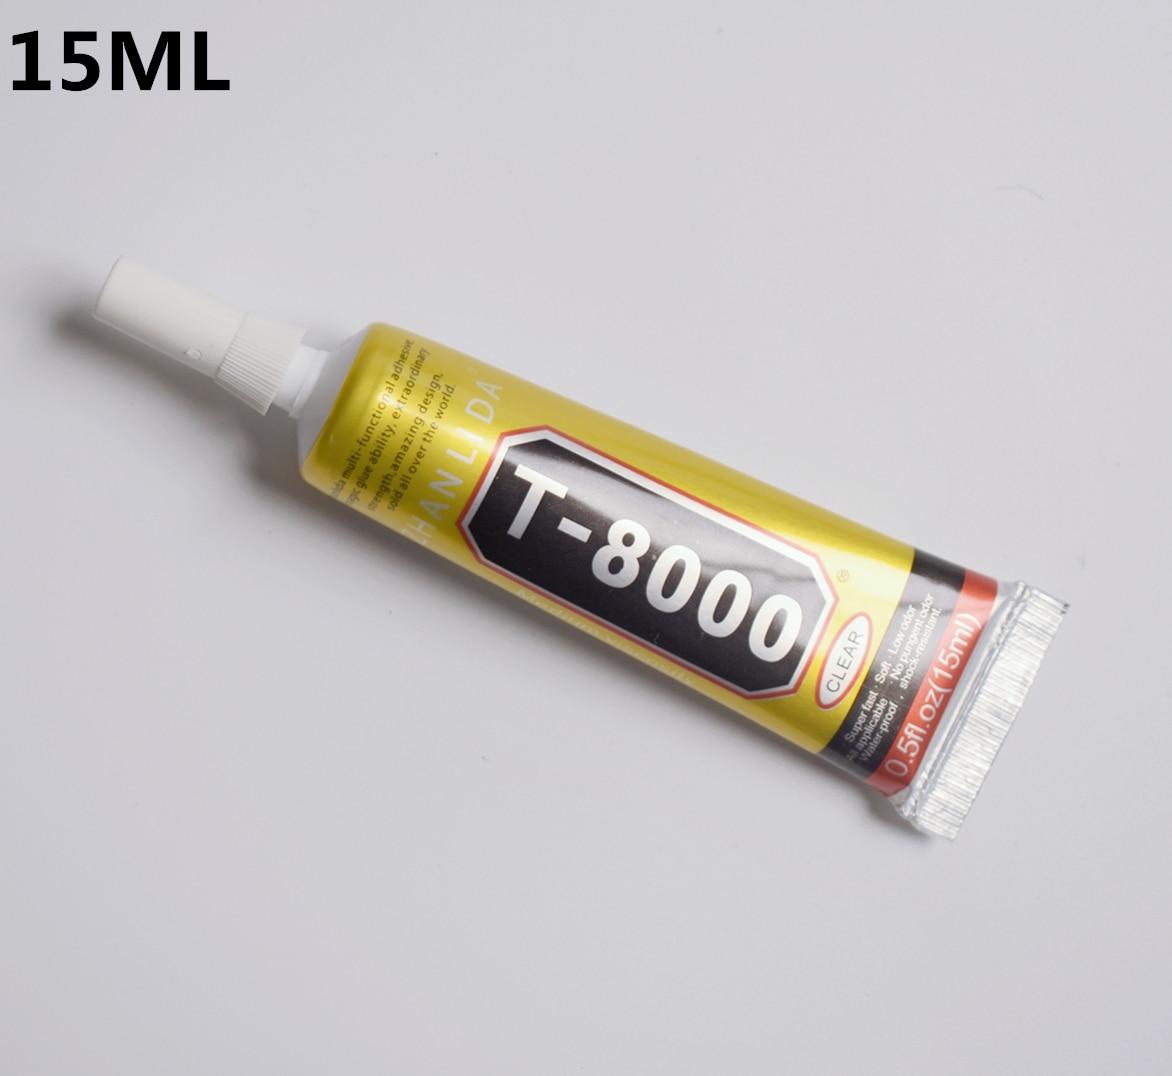 1 Pc 15ml T-8000 Glue T8000 Multi Purpose Glue Adhesive Epoxy Resin Repair Cell Phone LCD Touch Screen Super DIY Glue T 8000